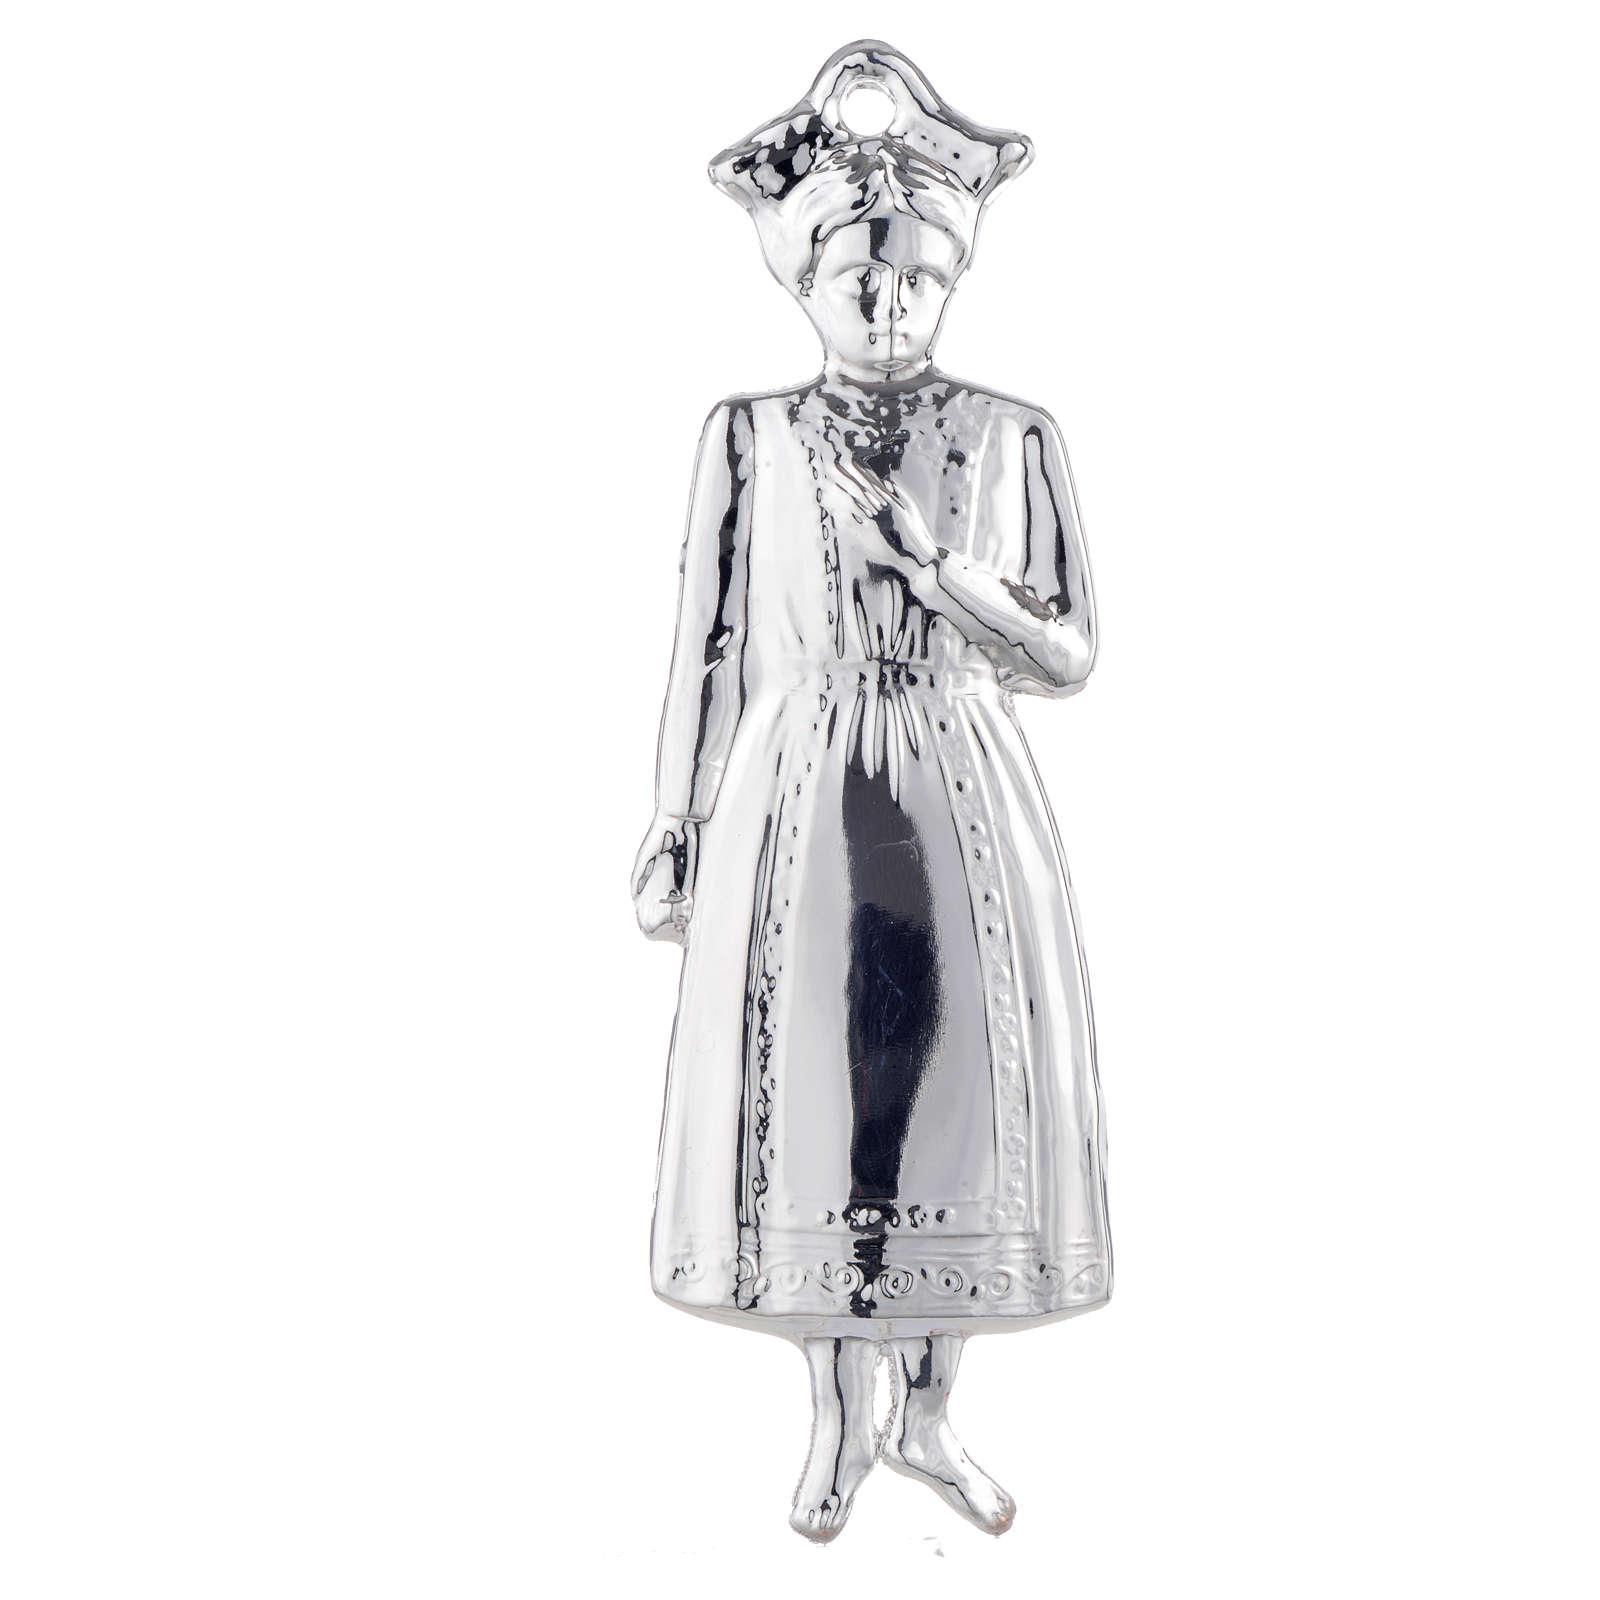 Ex-voto niña plata 925 o metal 15 cm. 3